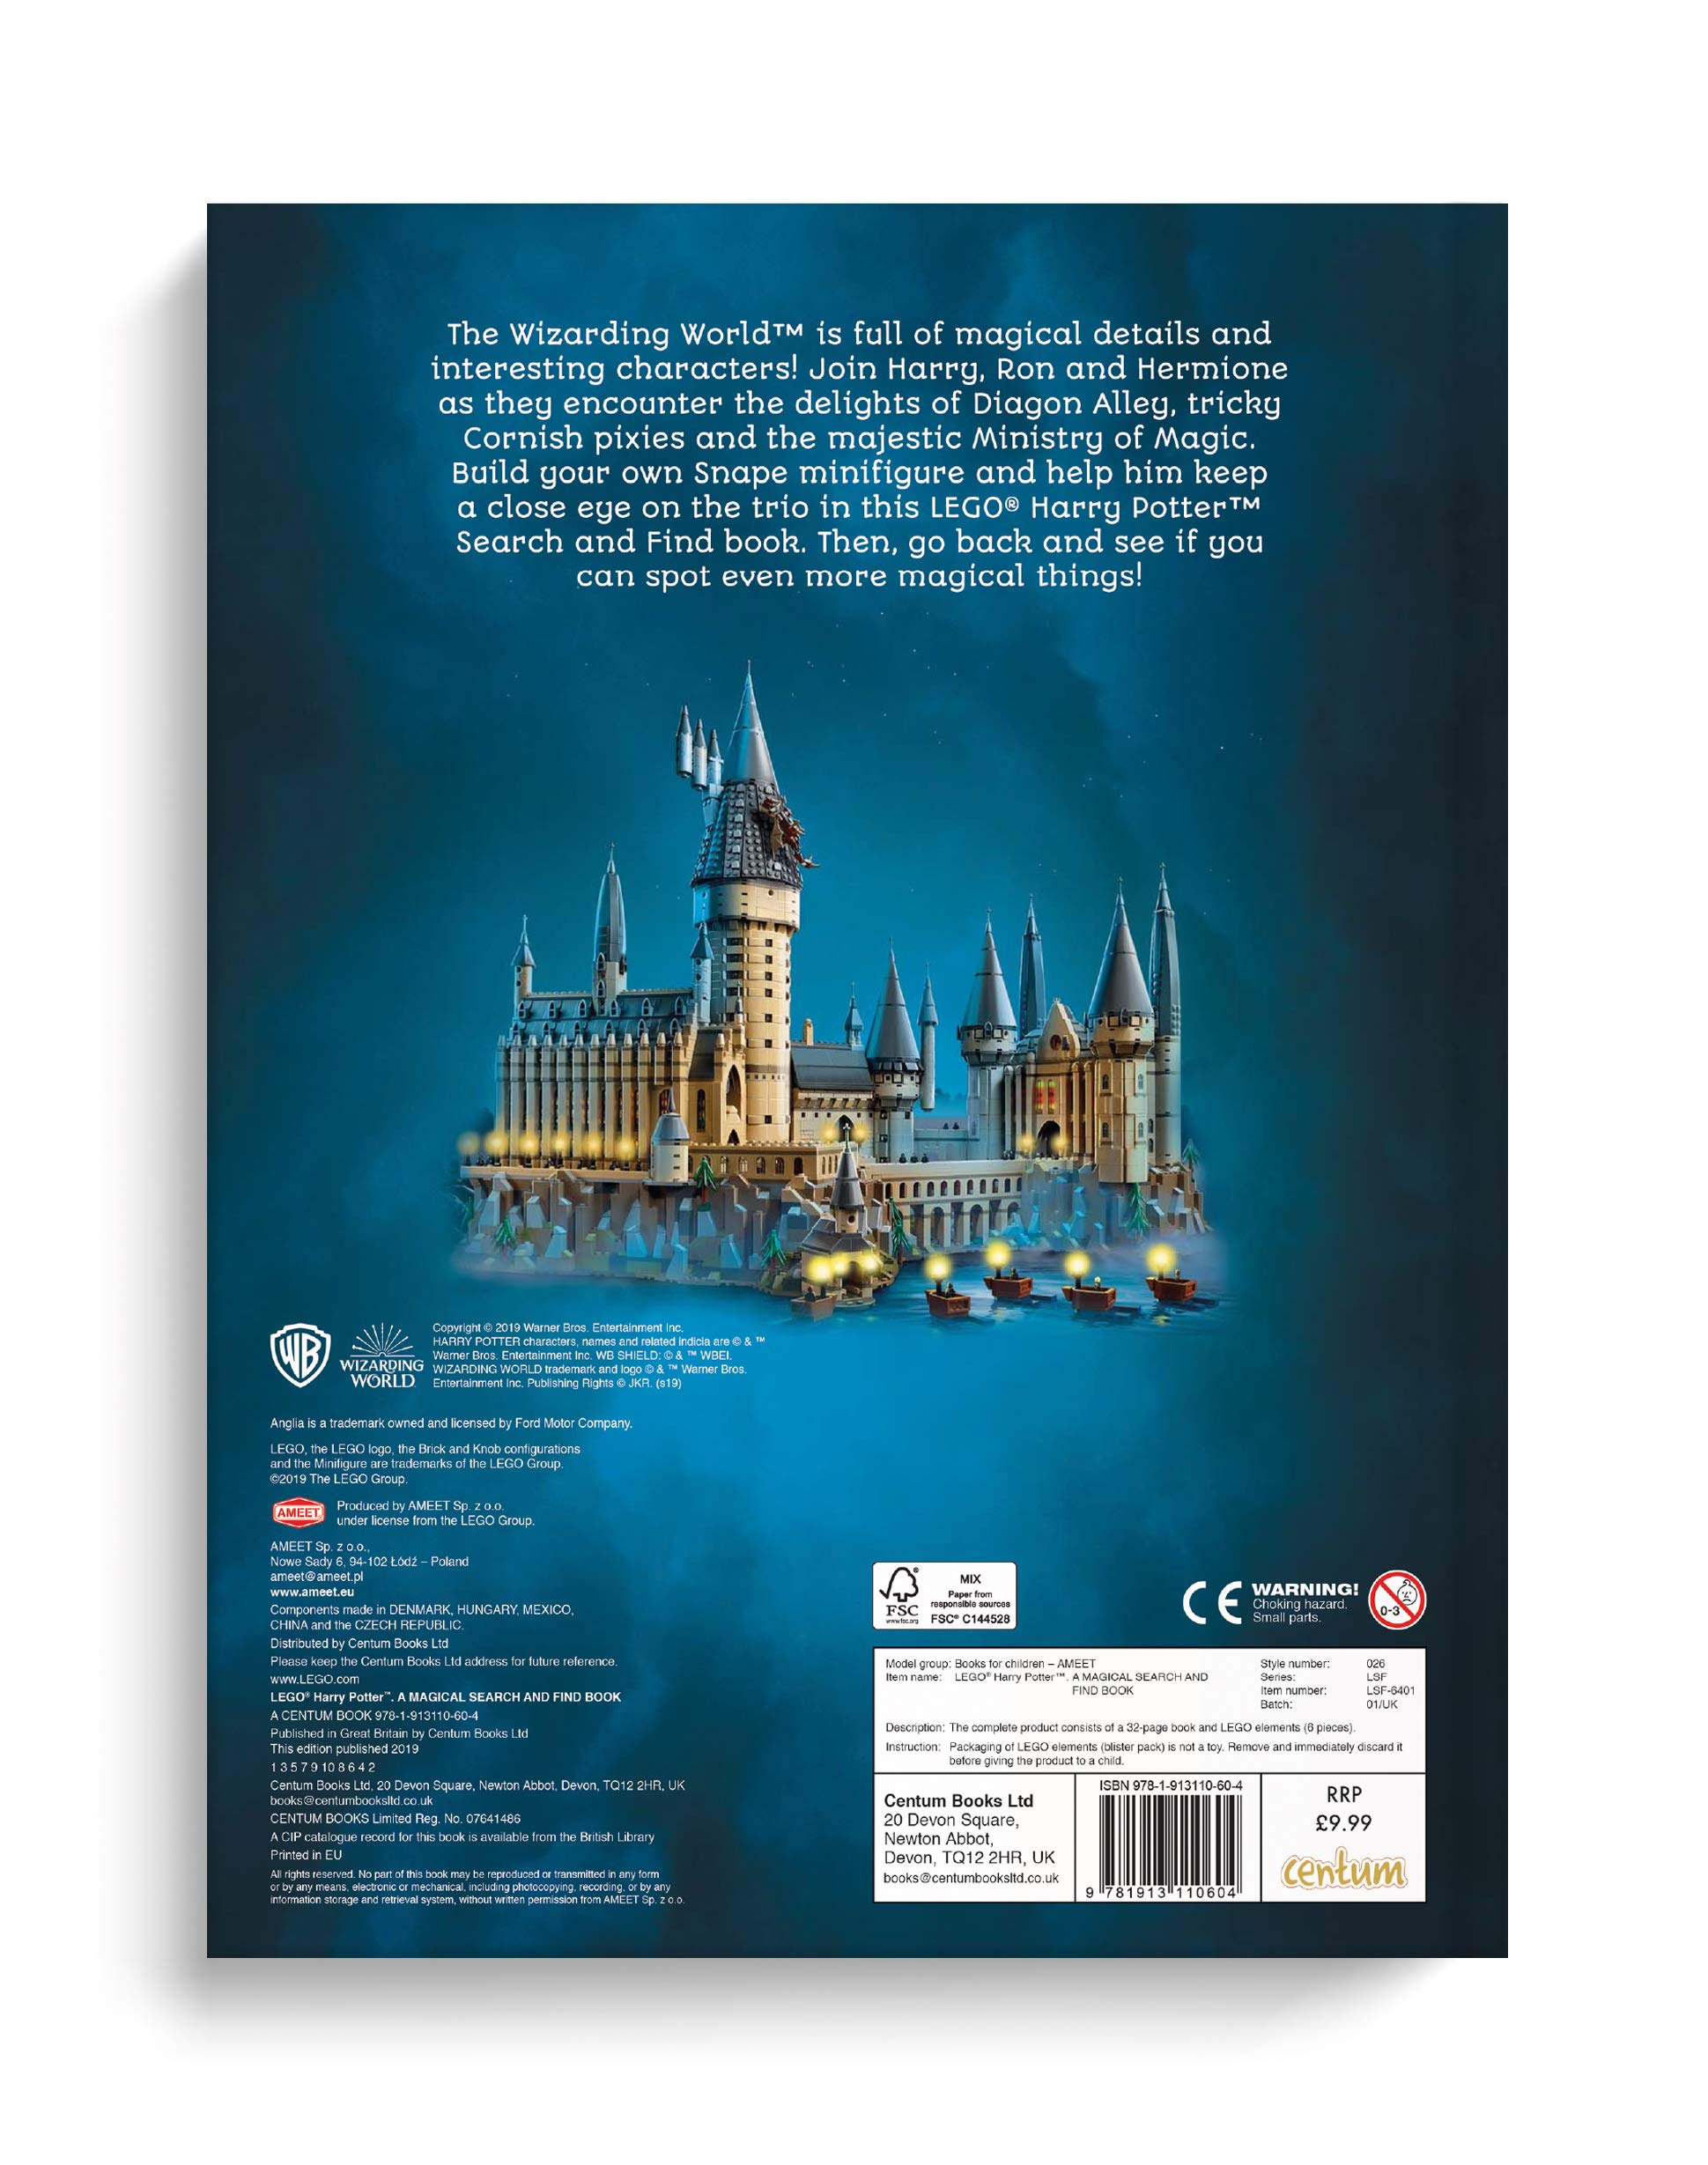 Lego - Harry Potter - Search & Find: Amazon.es: Centum Books Ltd: Libros en idiomas extranjeros